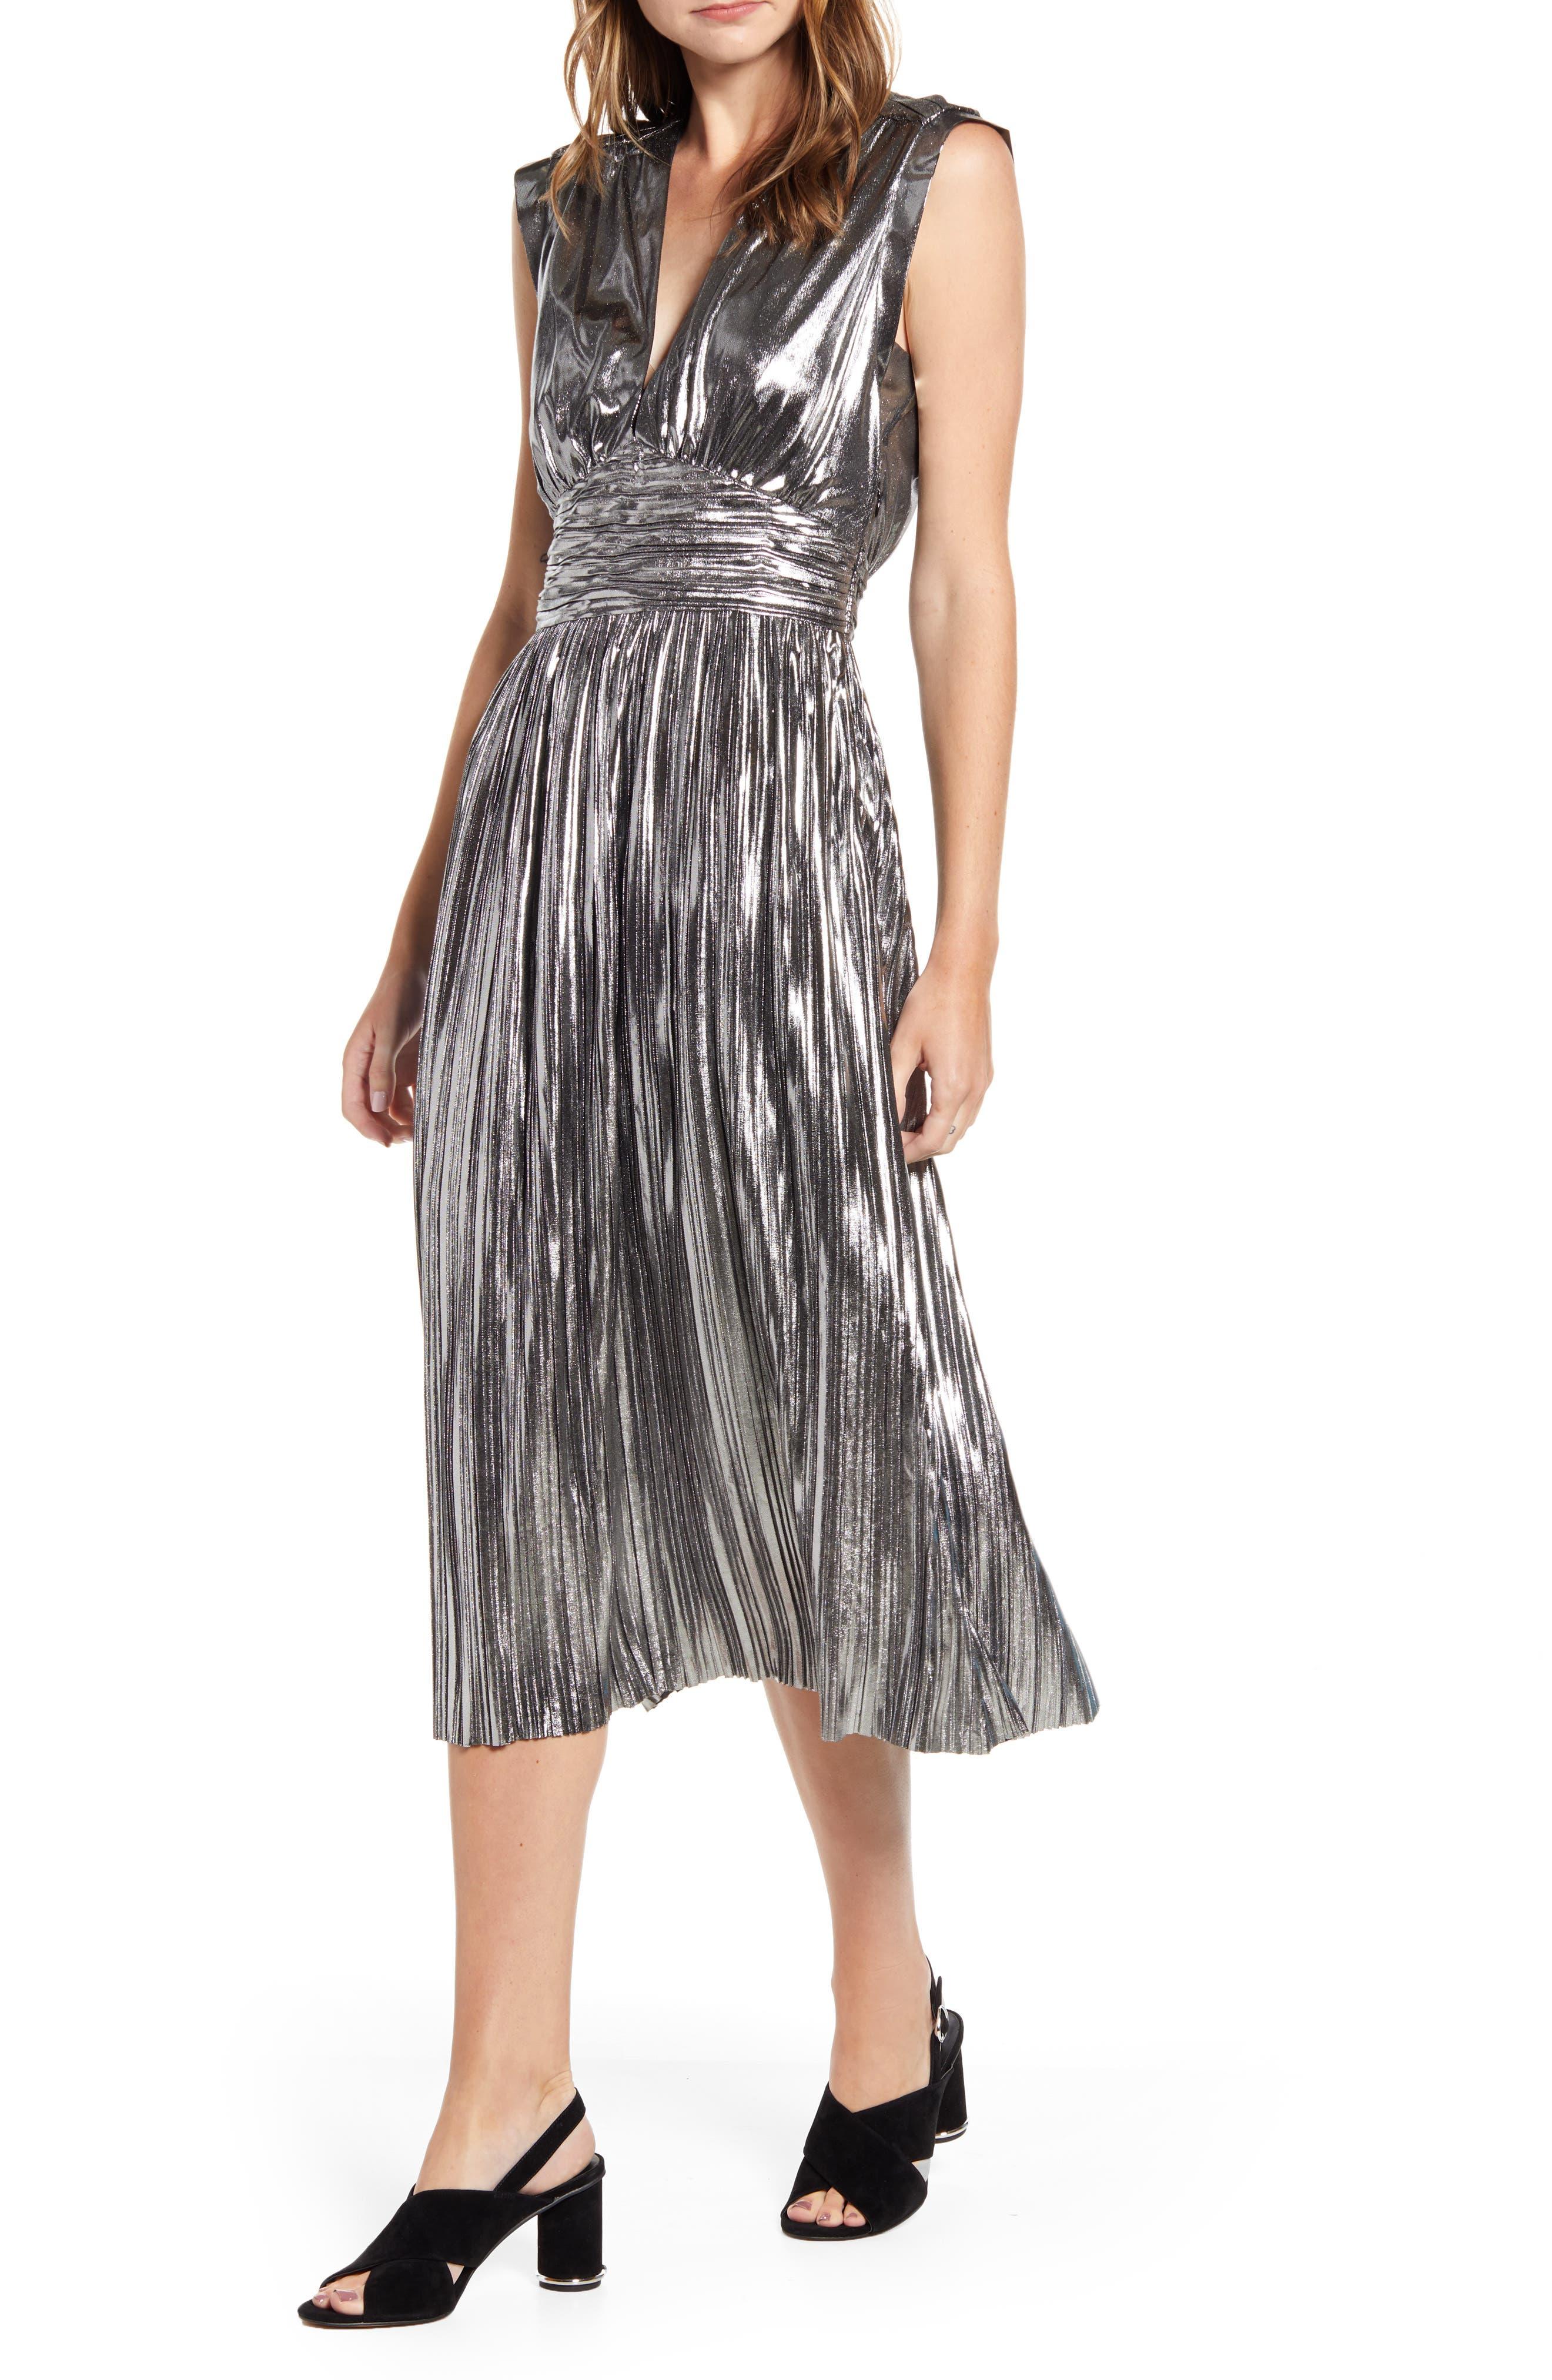 Vintage Cocktail Dresses, Party Dresses, Prom Dresses Womens Rebecca Minkoff Briella Metallic Halter Pleated Dress $298.00 AT vintagedancer.com